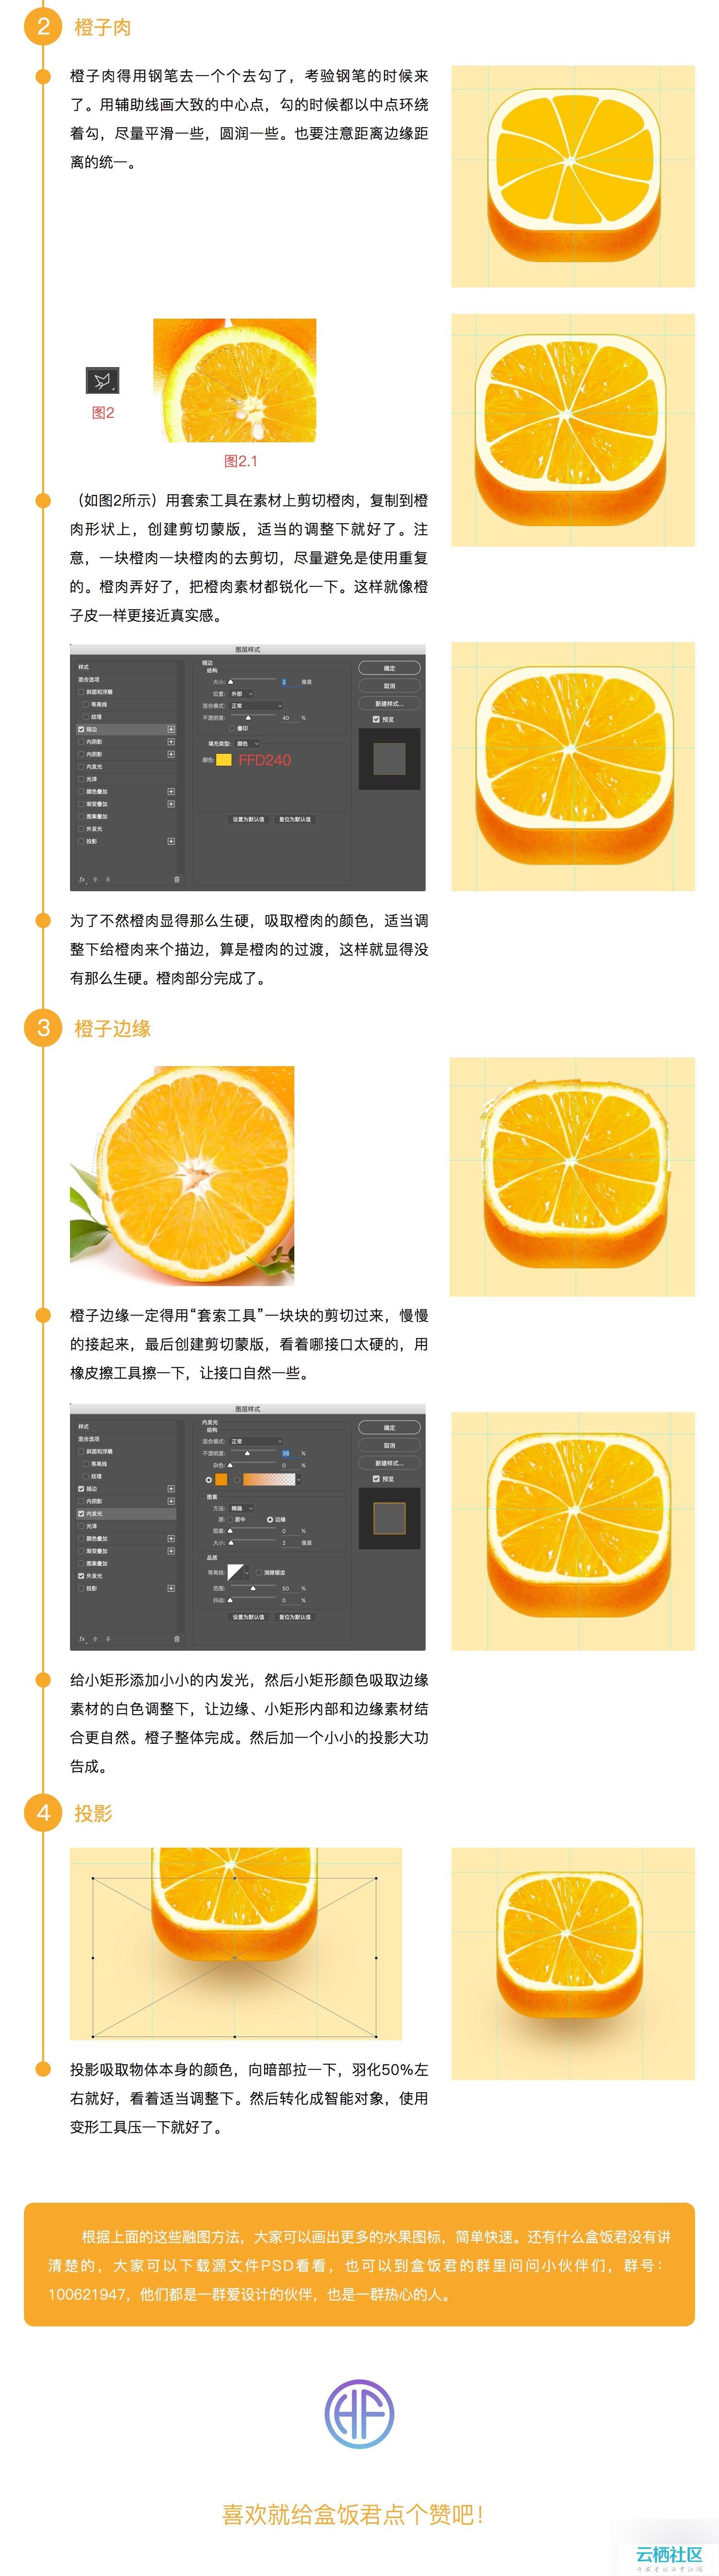 PS鼠绘有创意逼真的橙子APP图标-橙子图标